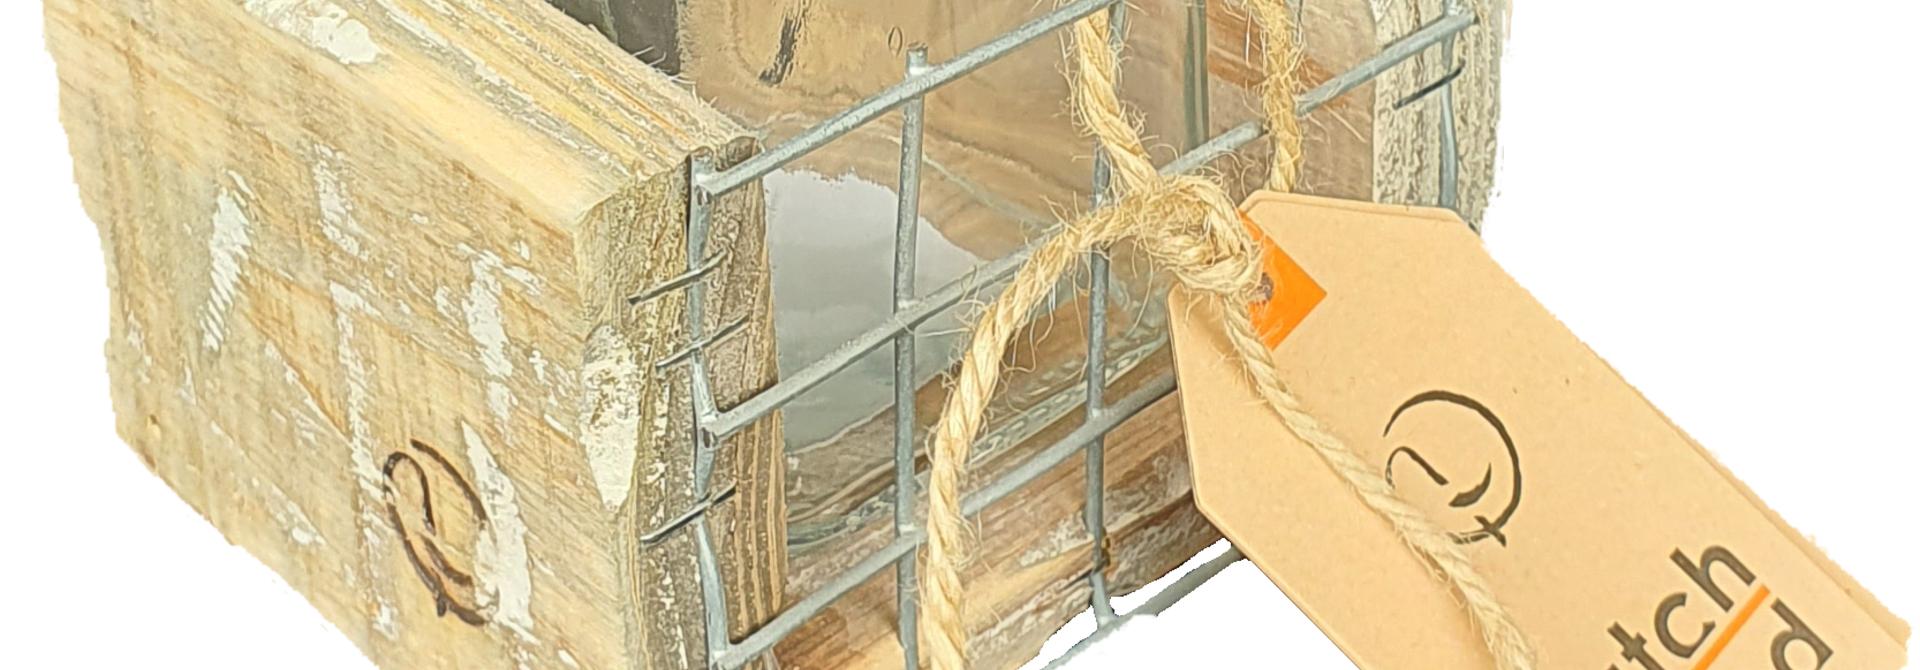 trayold dutchglass bask SQ1